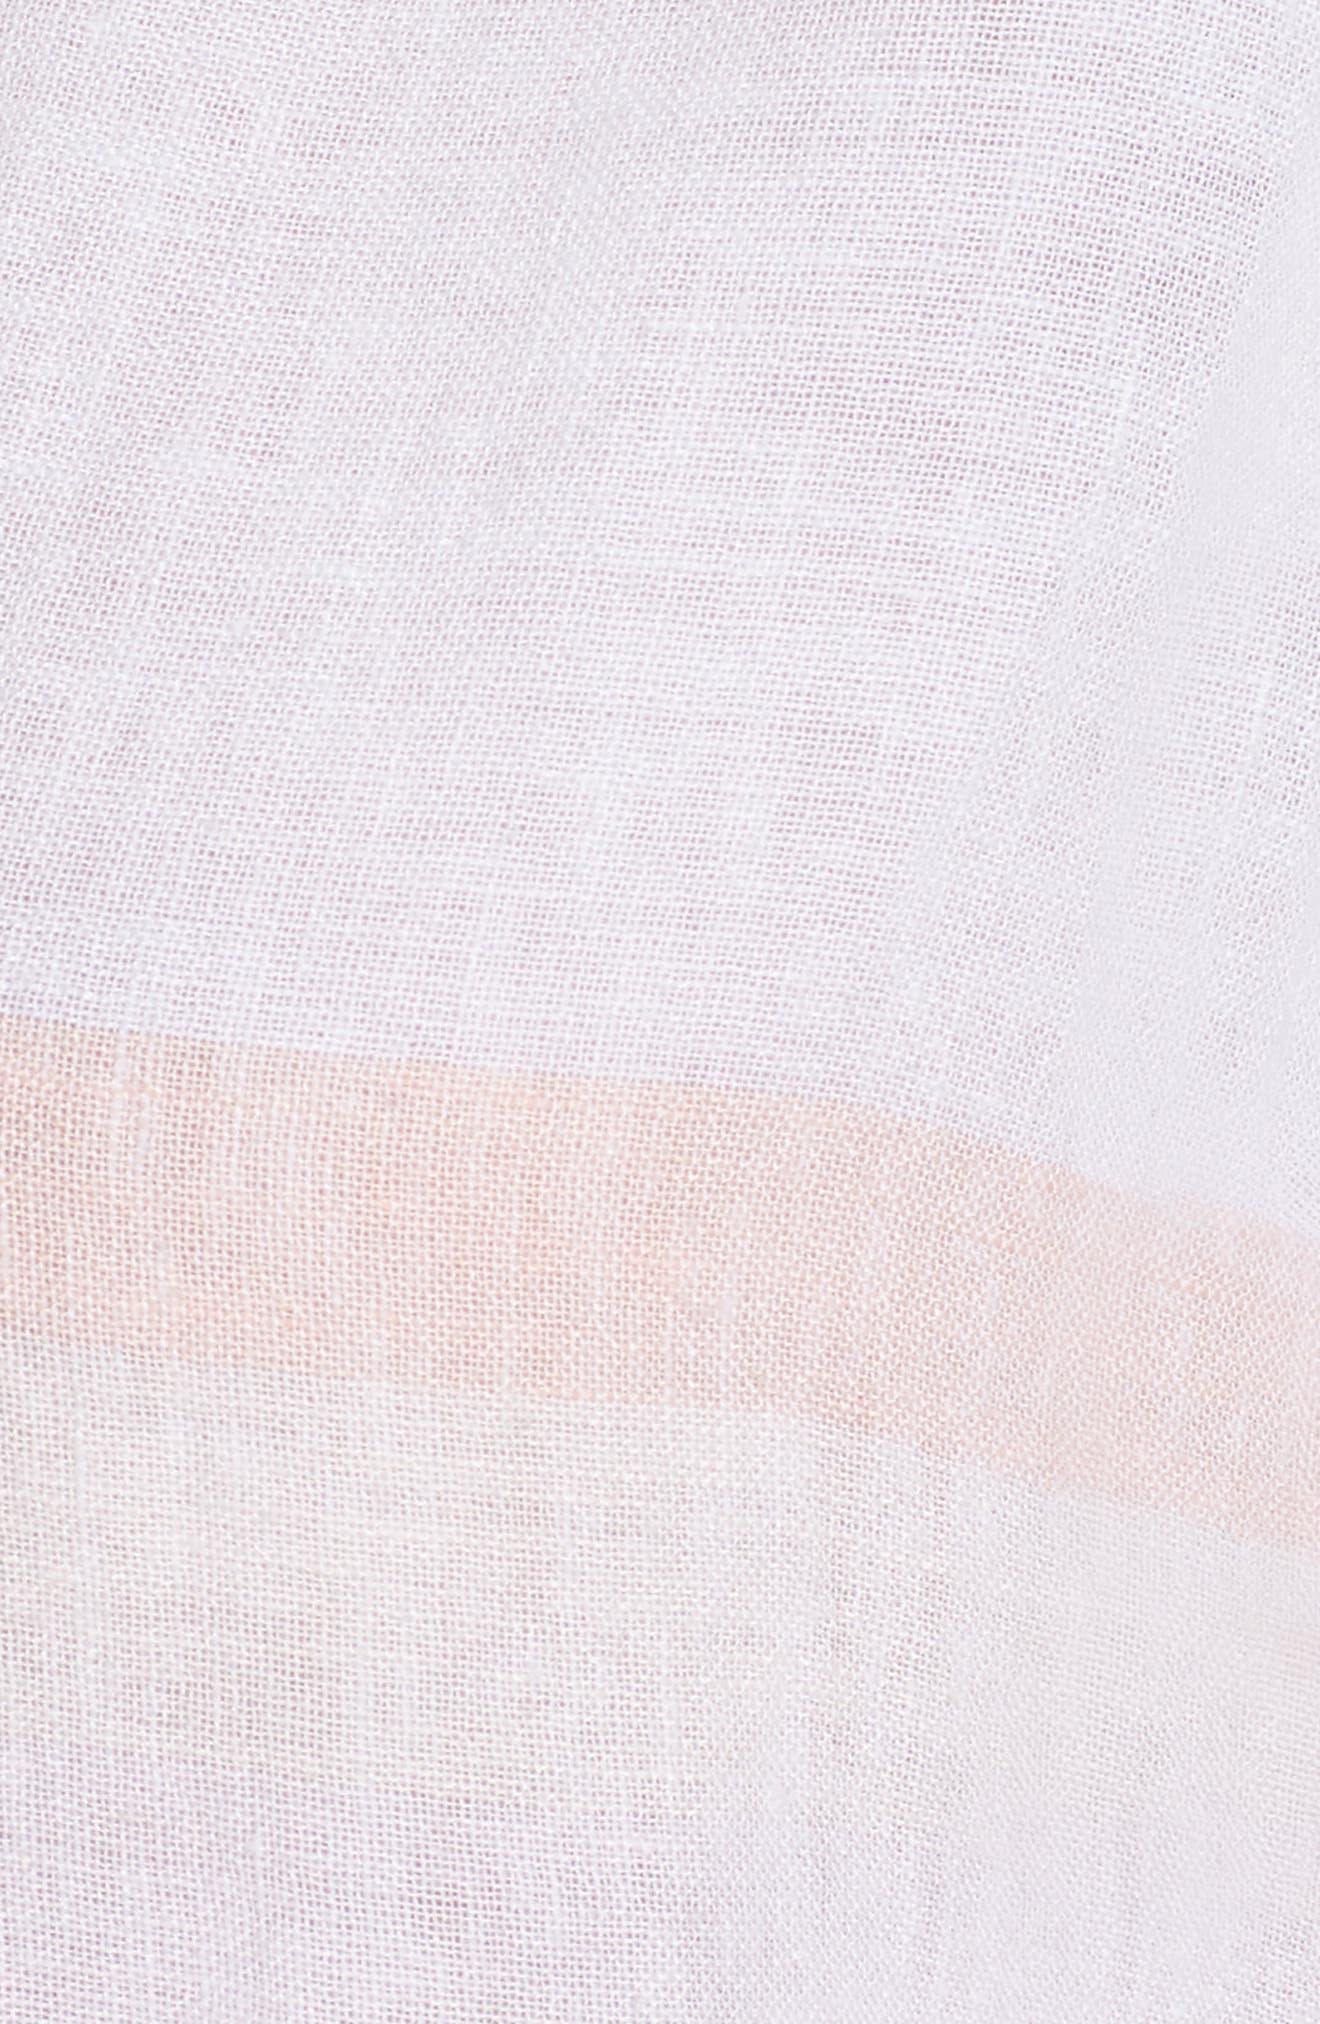 Lily Lace-Up Blouse,                             Alternate thumbnail 6, color,                             Seychelles Stripe